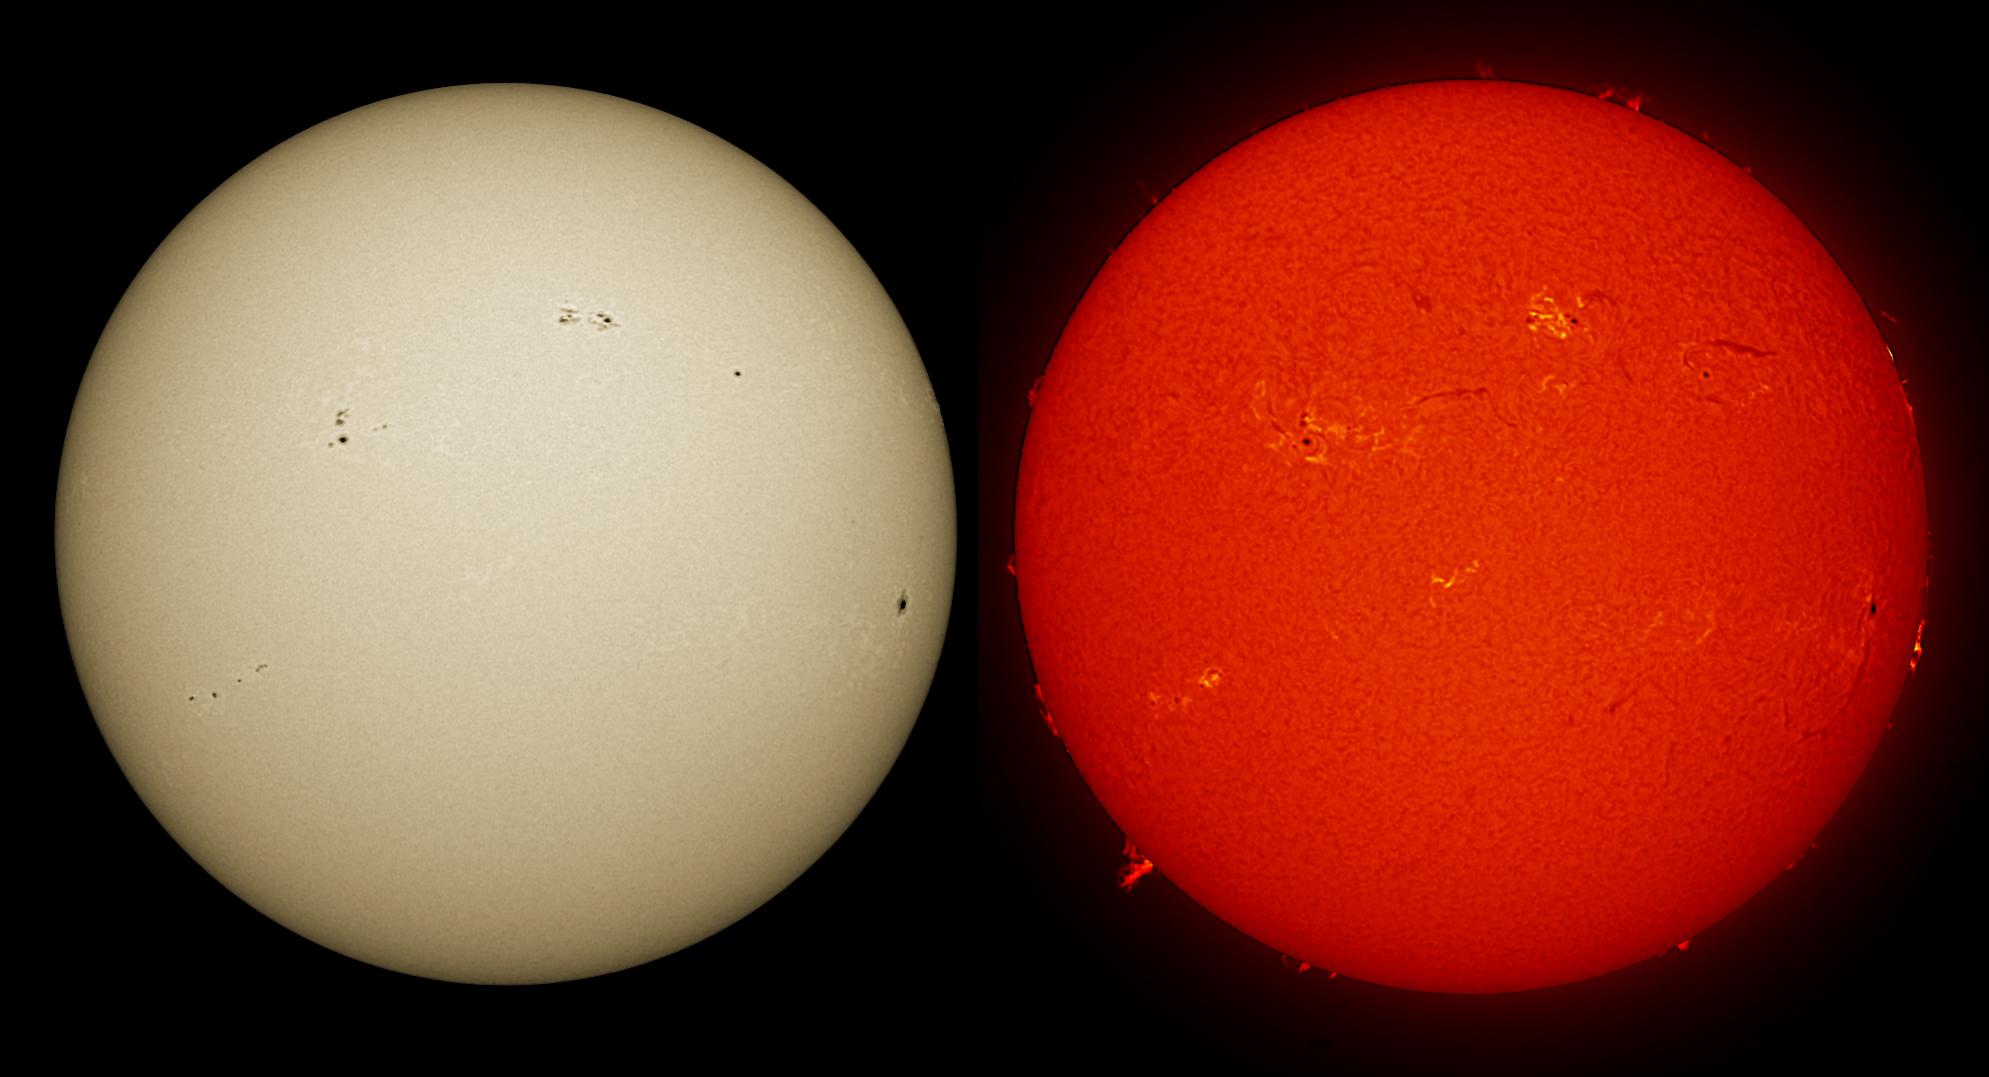 The Sun - April 10, 2013